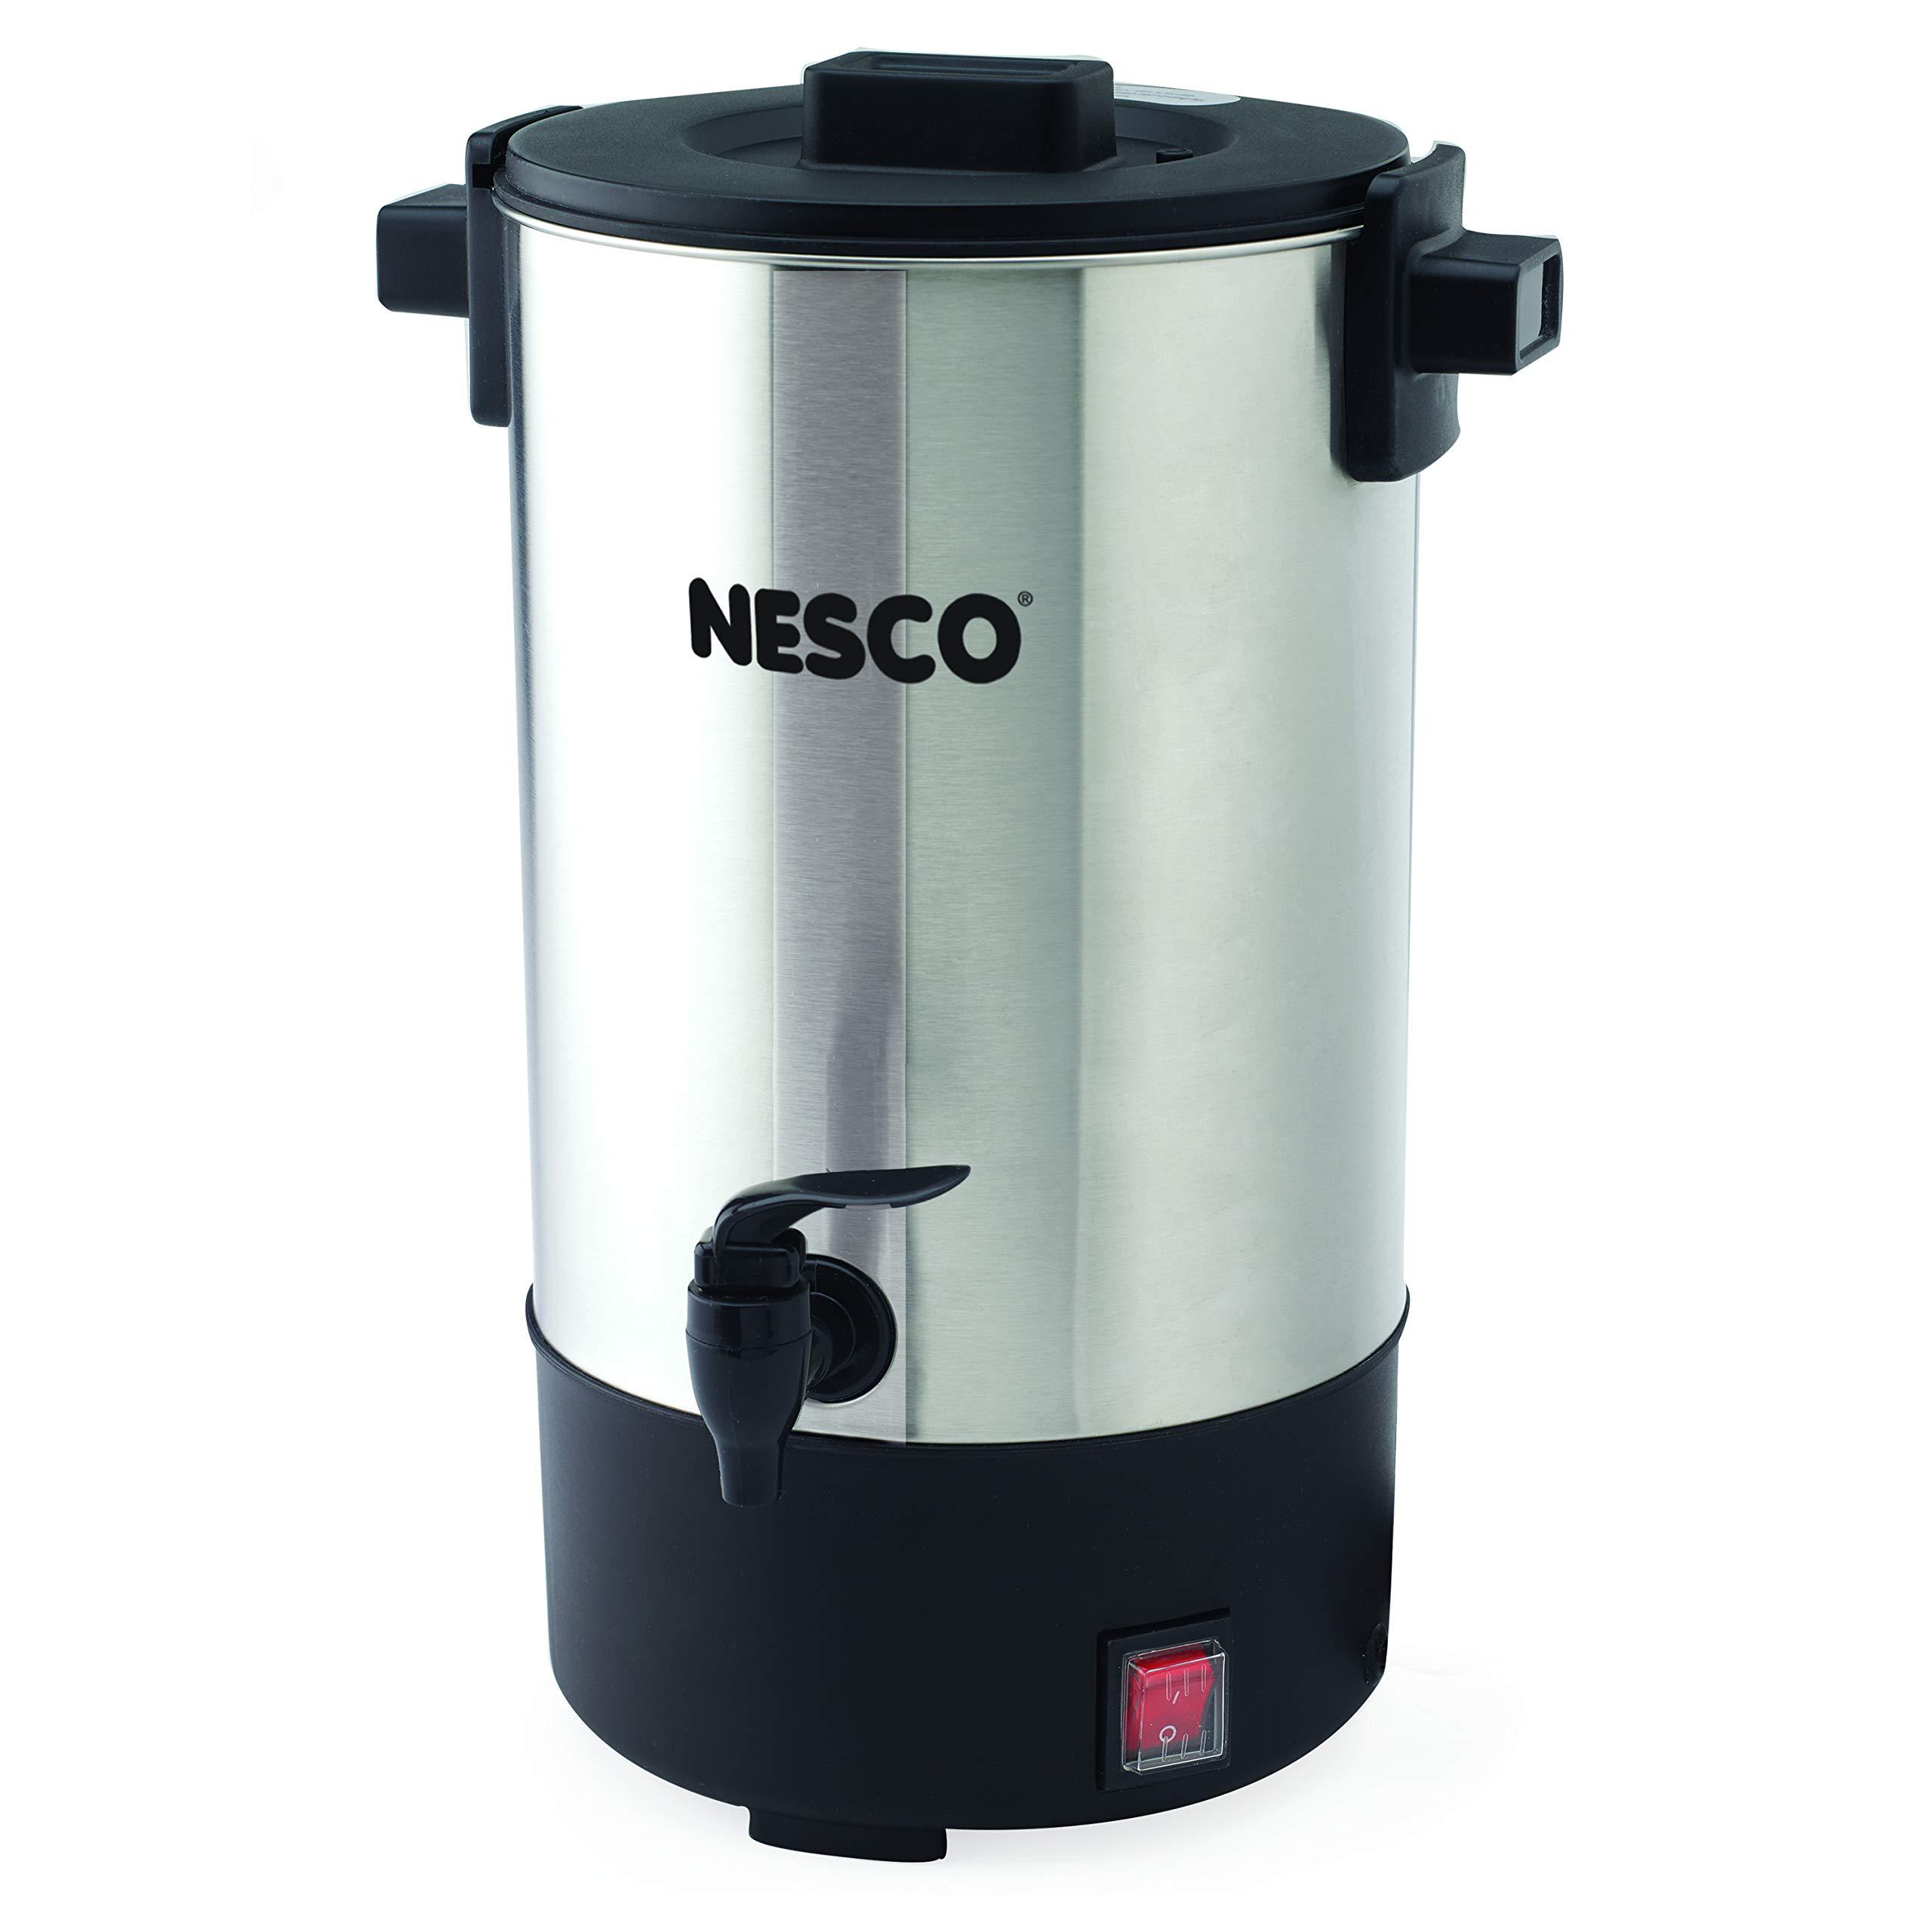 NESCO CU-25, Professional Coffee Urn, 25 Cups, Stainless Steel by Nesco